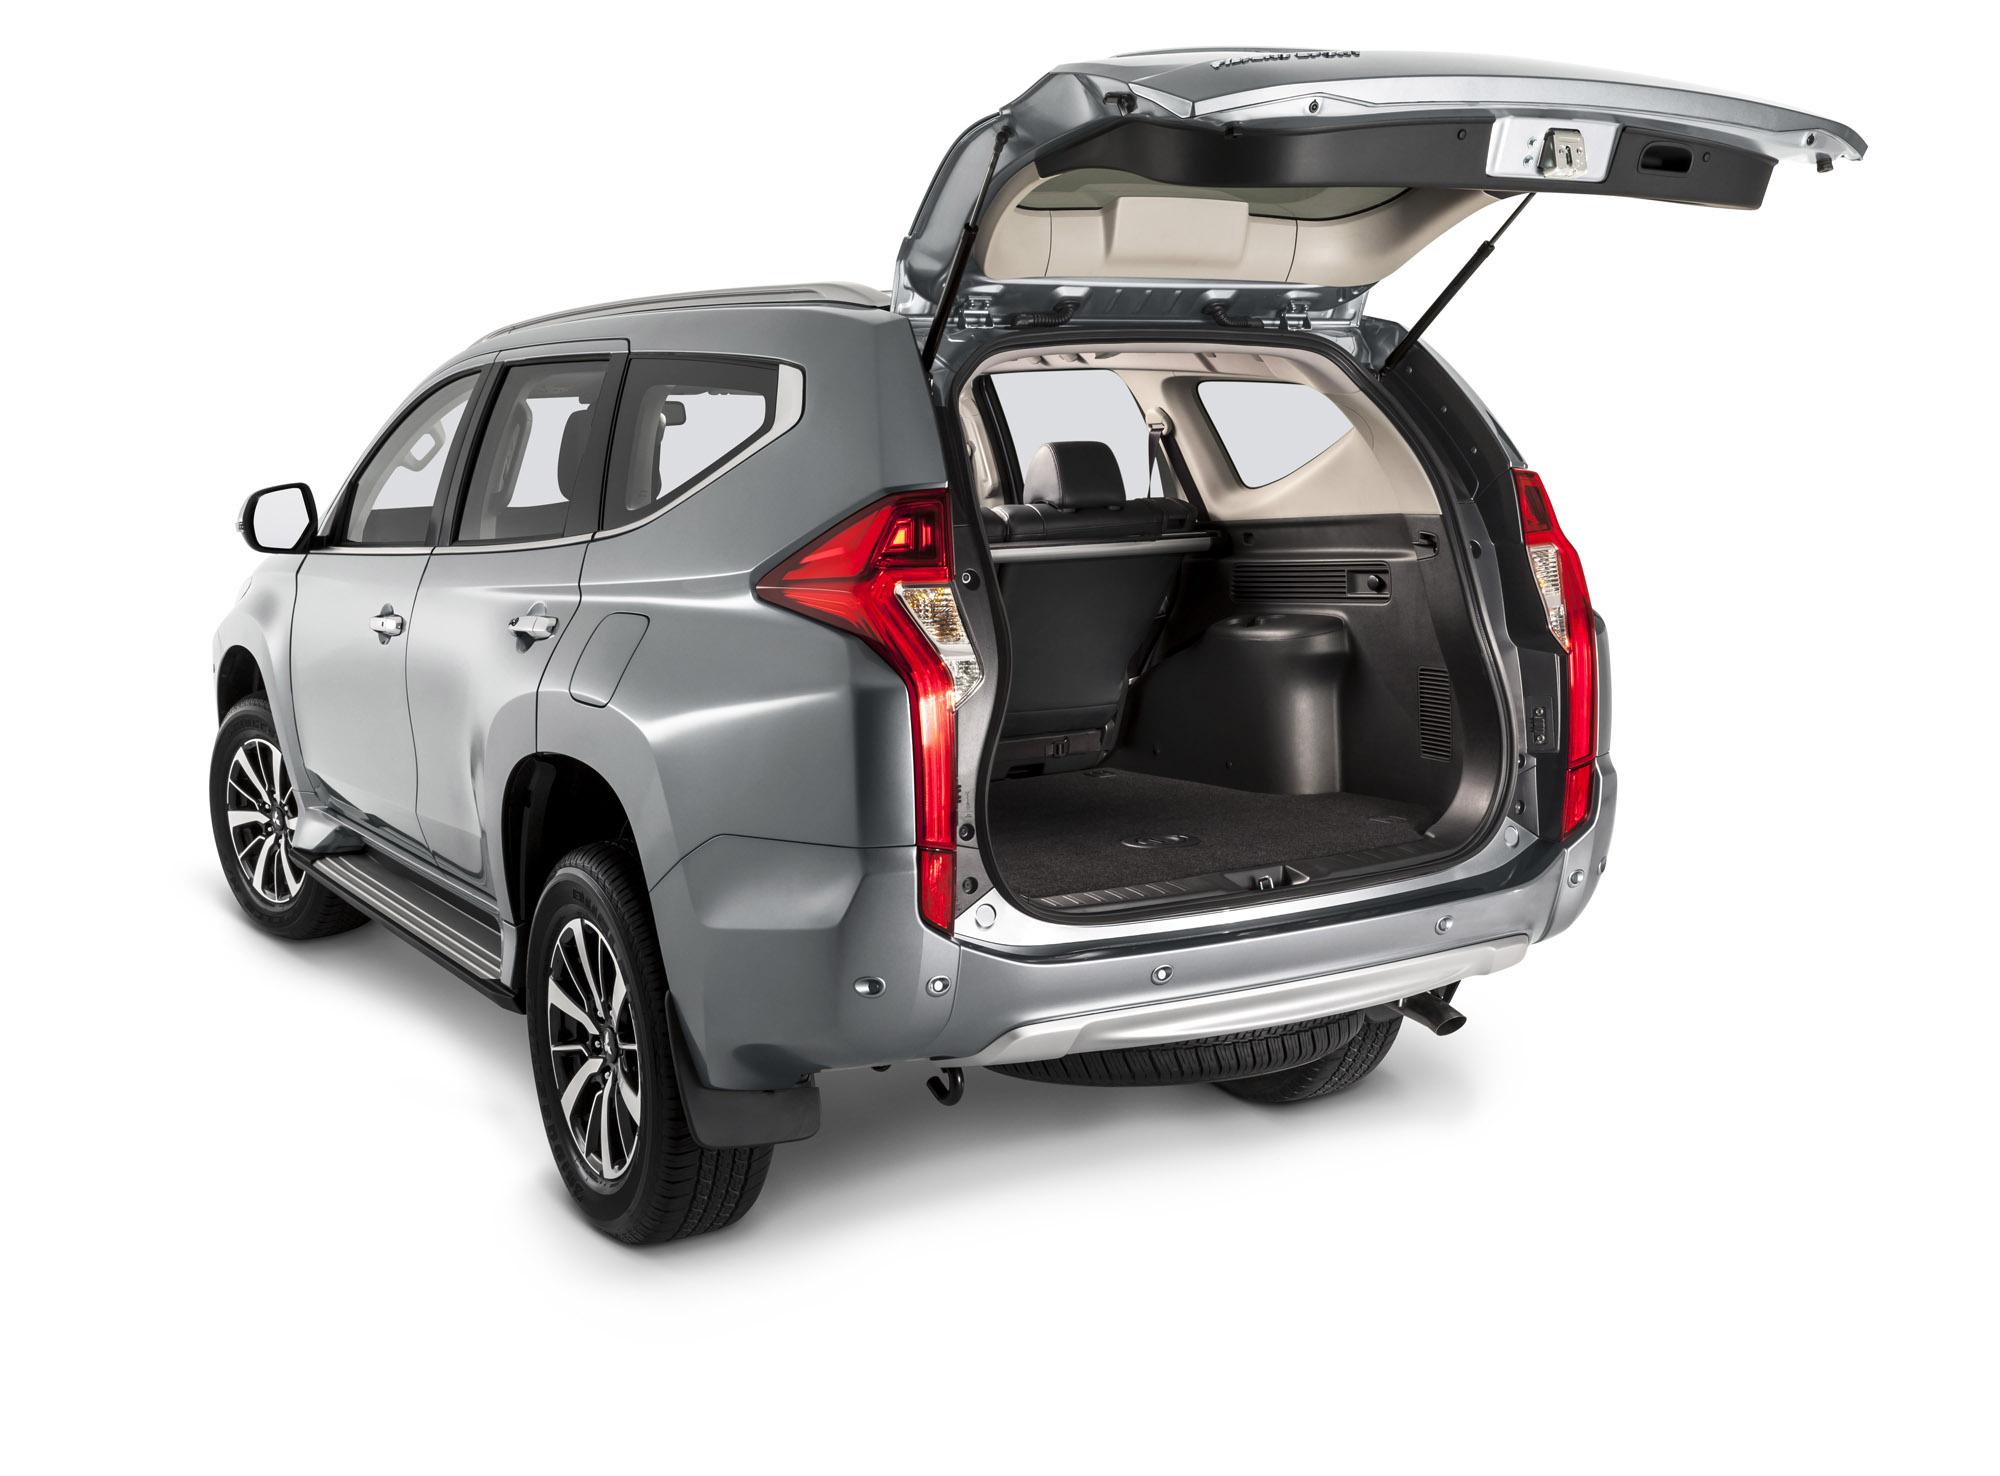 2016 Mitsubishi Pajero Sport Review Caradvice